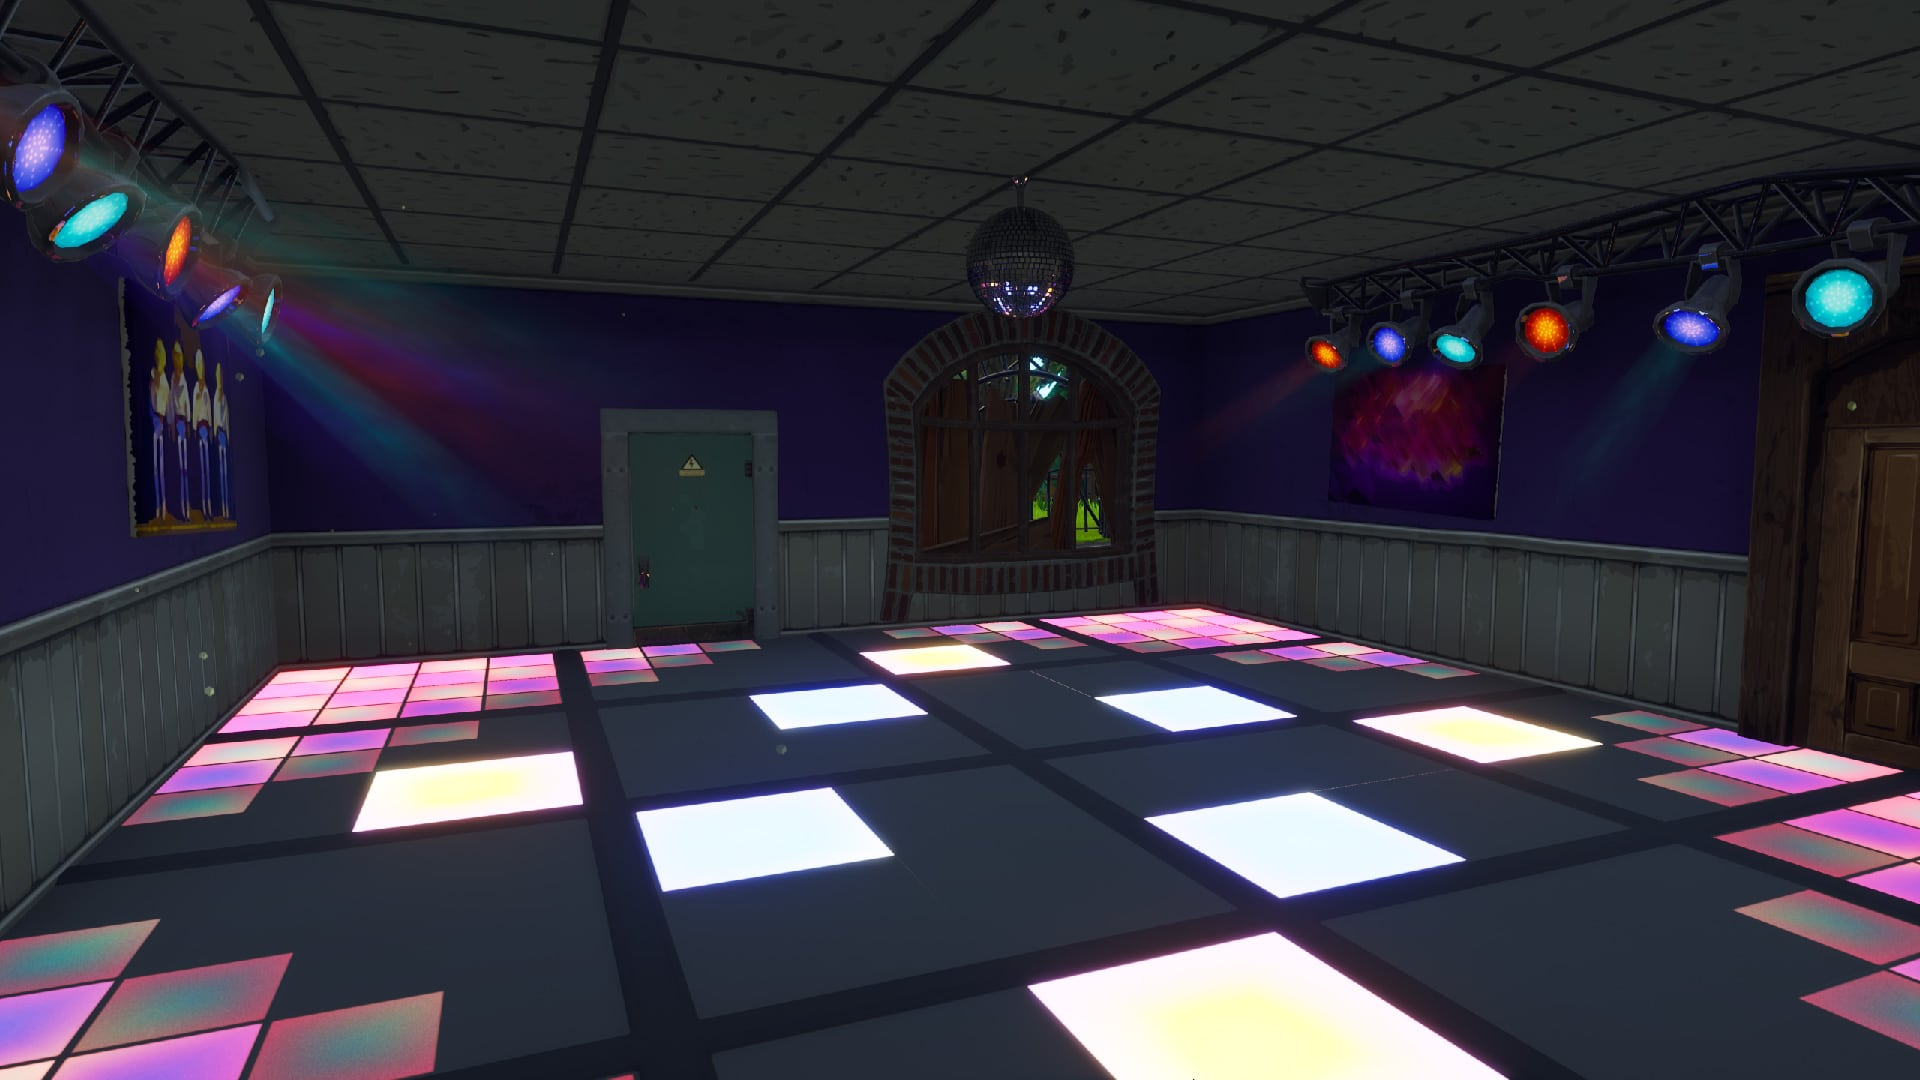 Animal Crossing Fall Wallpaper Fortnite Salles De Disco Pour Les D 233 Fis De La Semaine 9